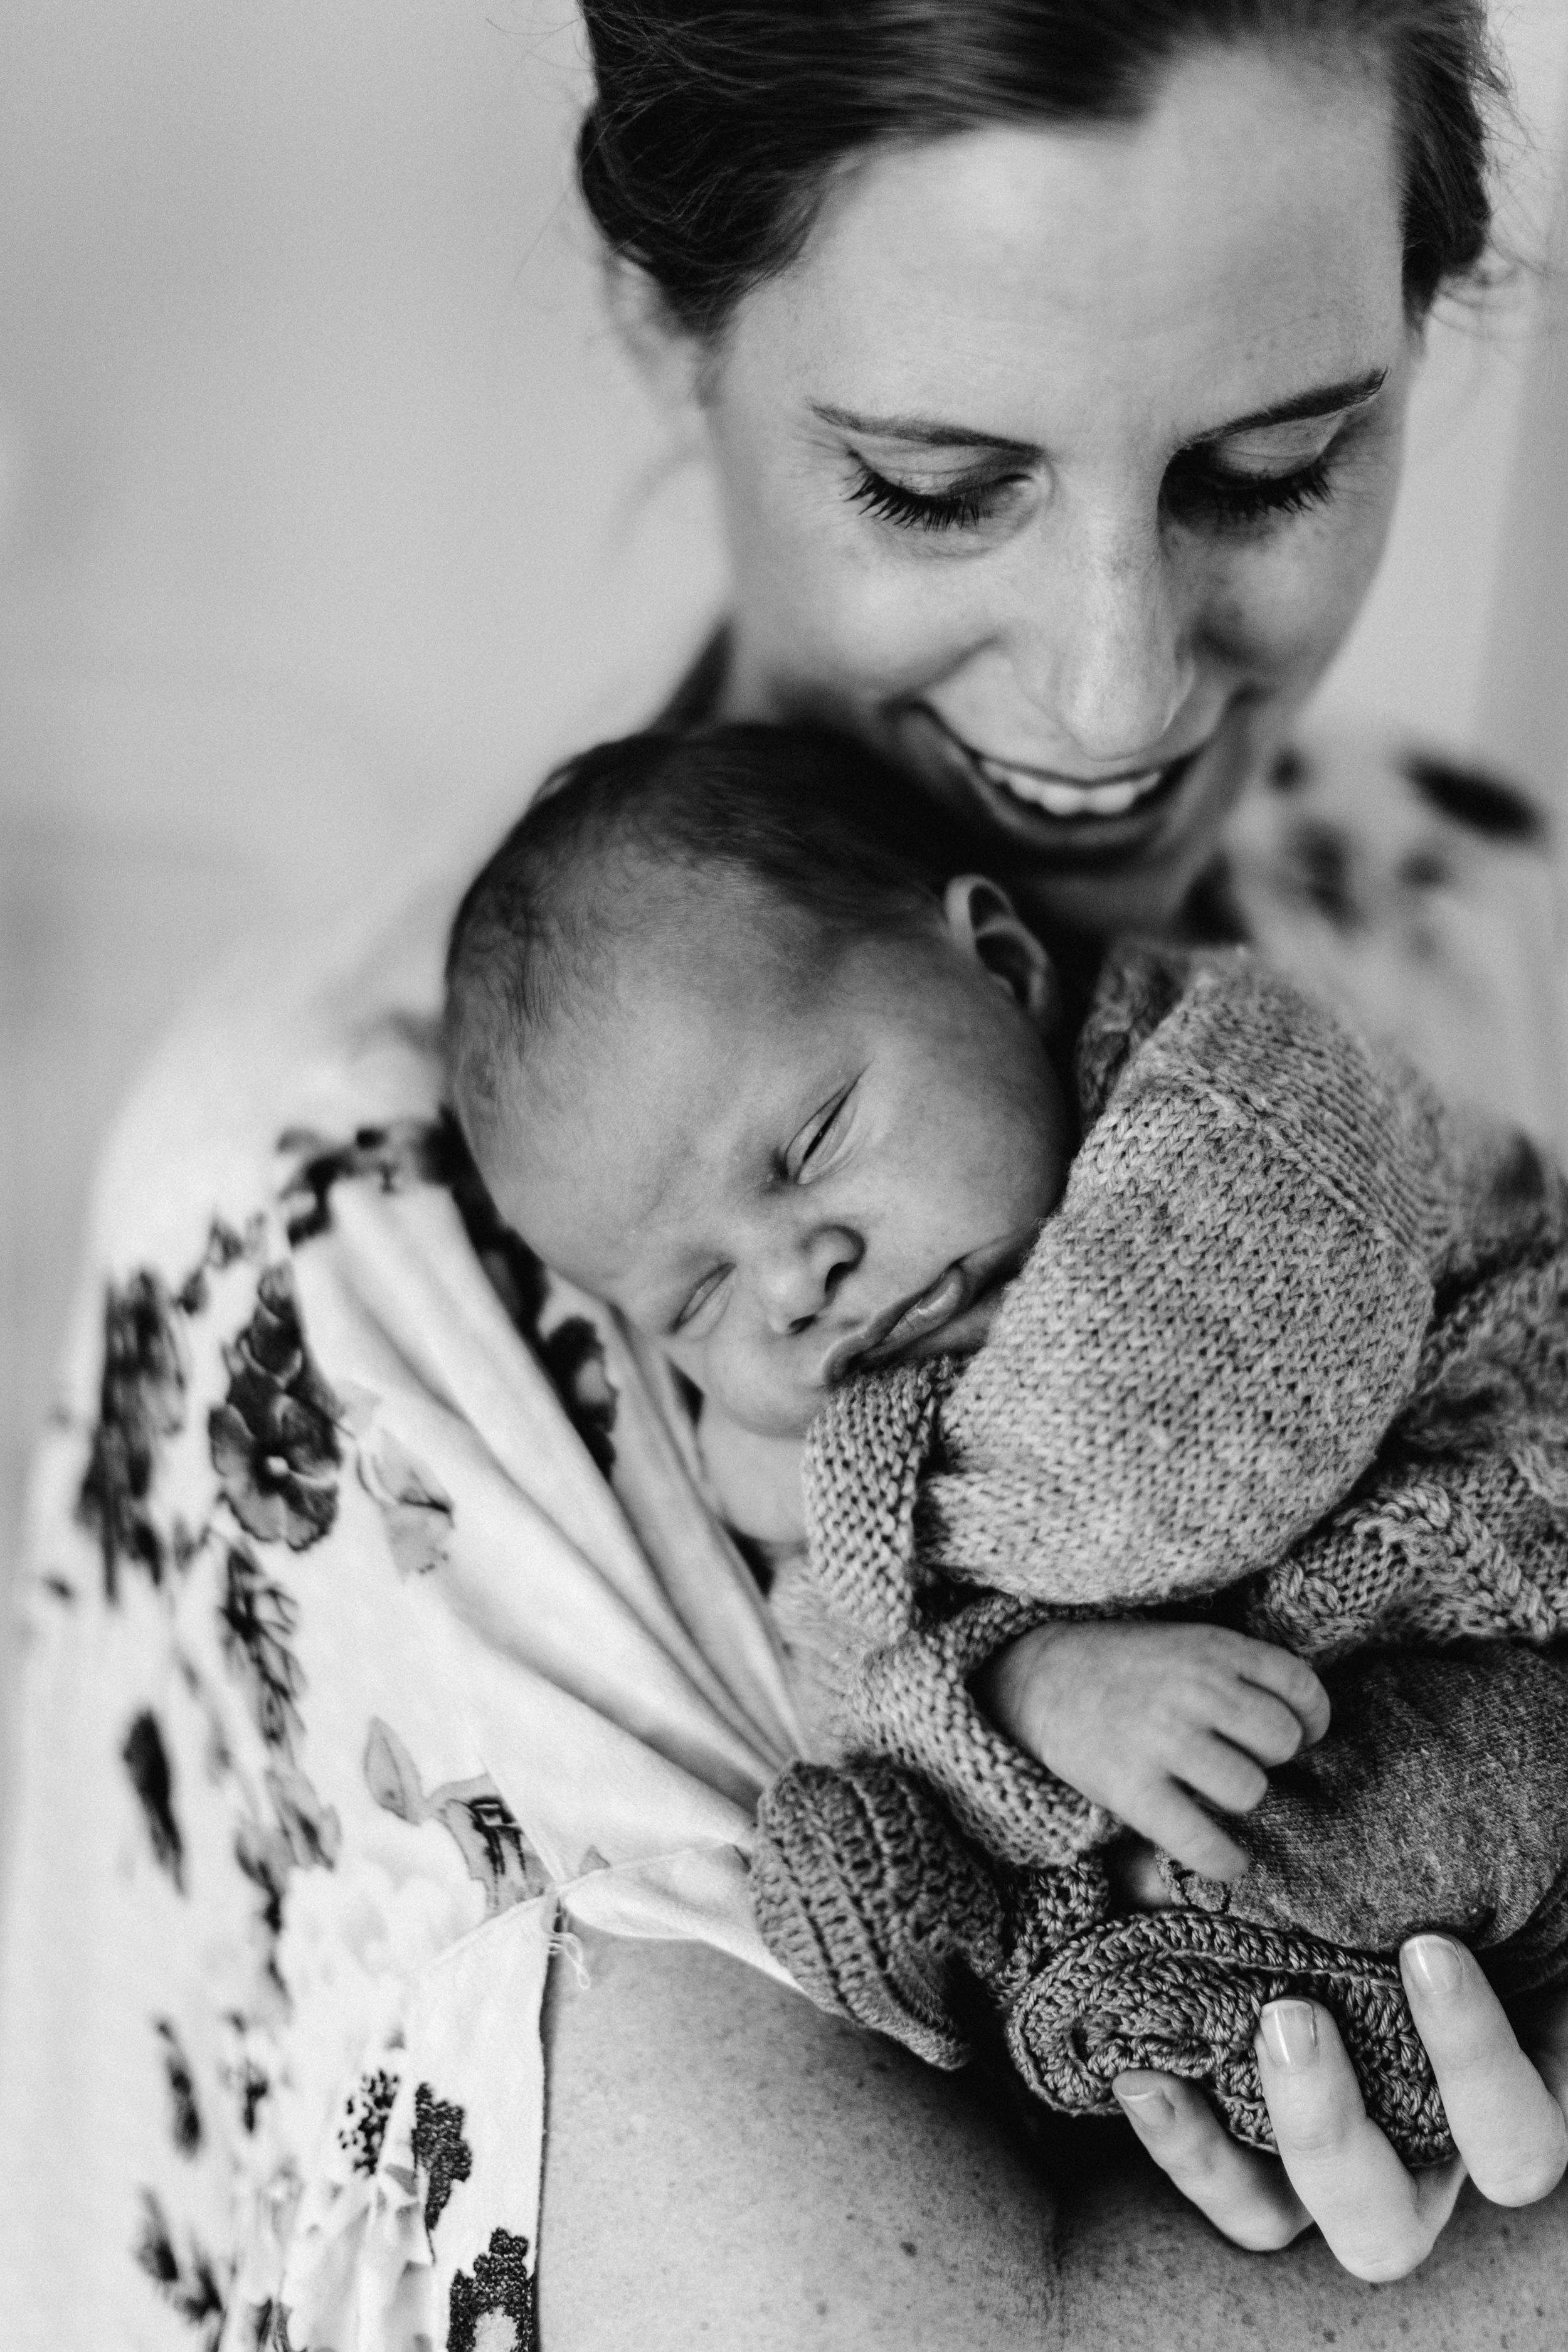 bowral-newborn-photographer-family-herrmann-southern-highlands-16.jpg